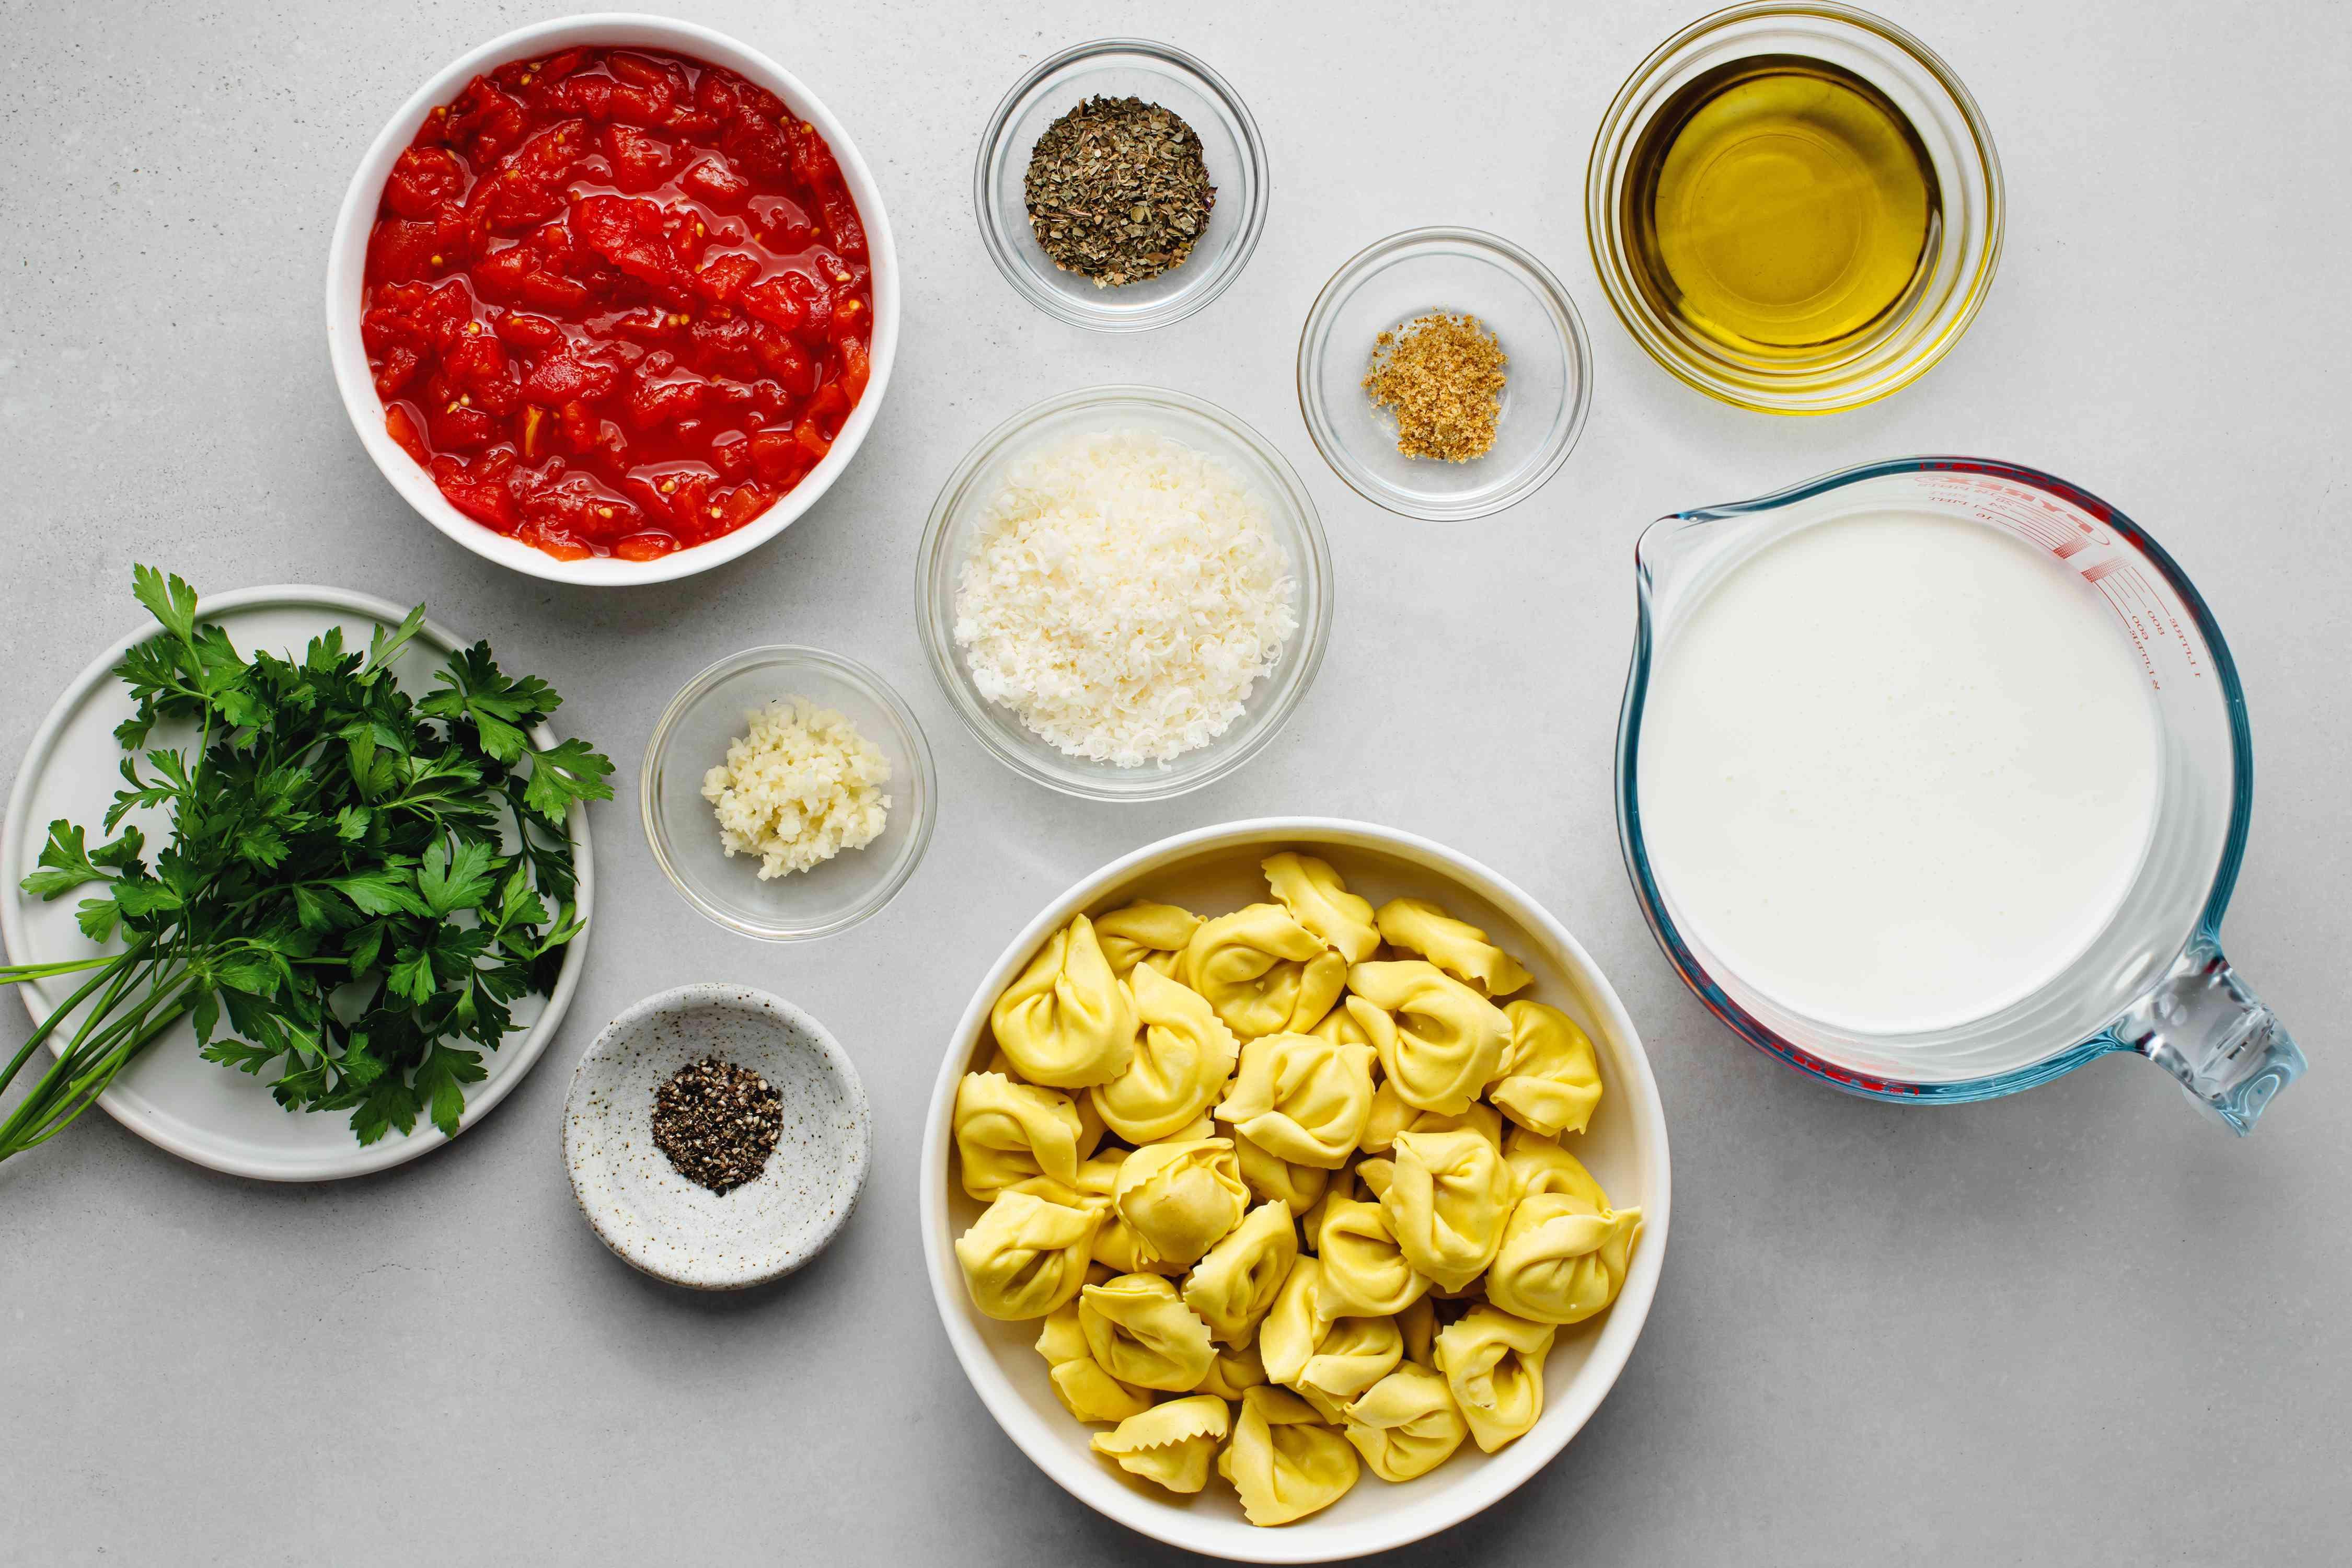 Tortellini With Tomato Basil Cream Sauce ingredients